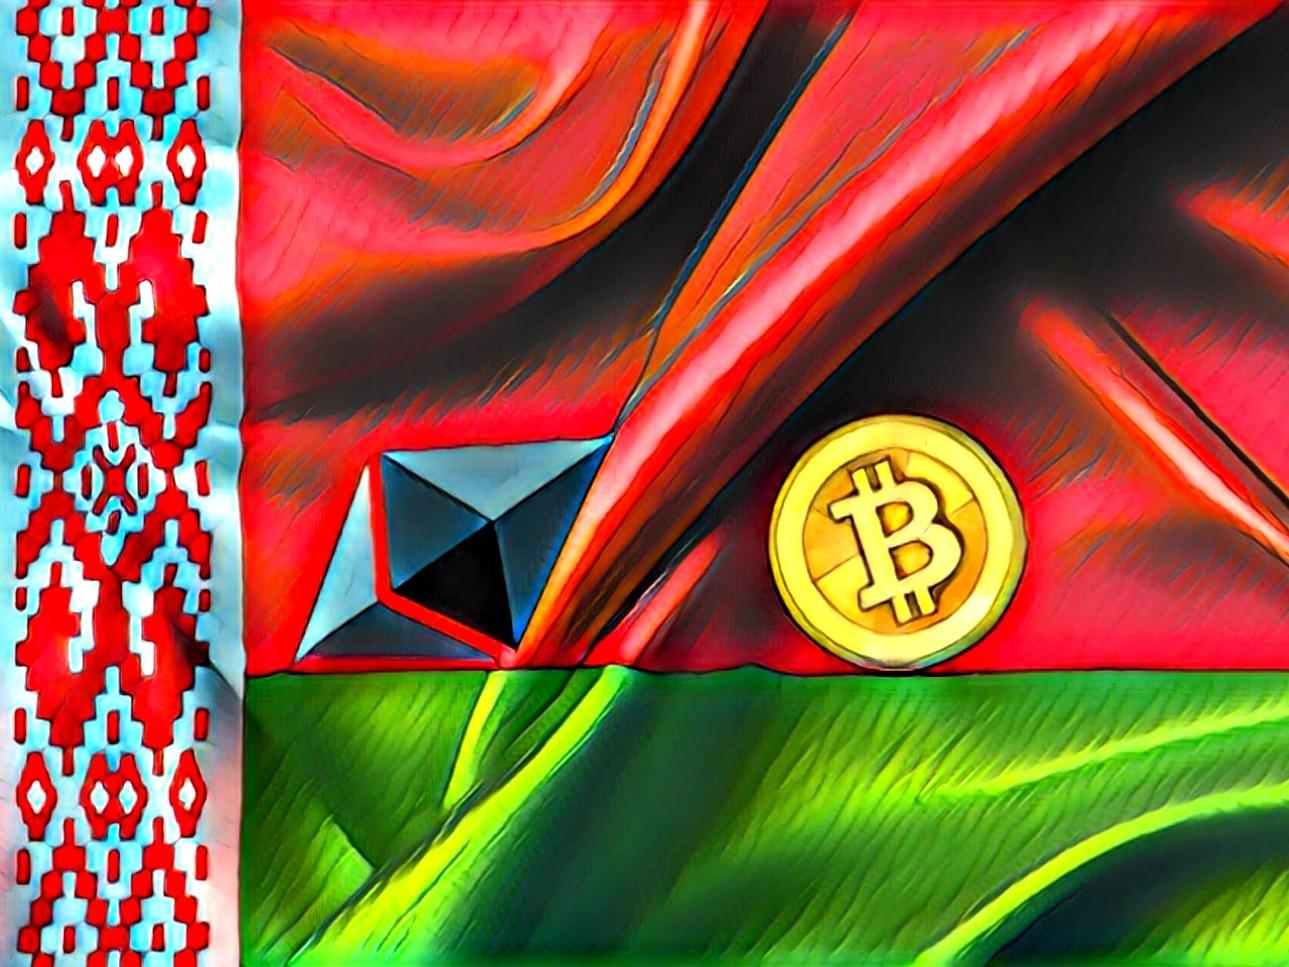 Belarus Bitcoin BTC Ethereum ETH